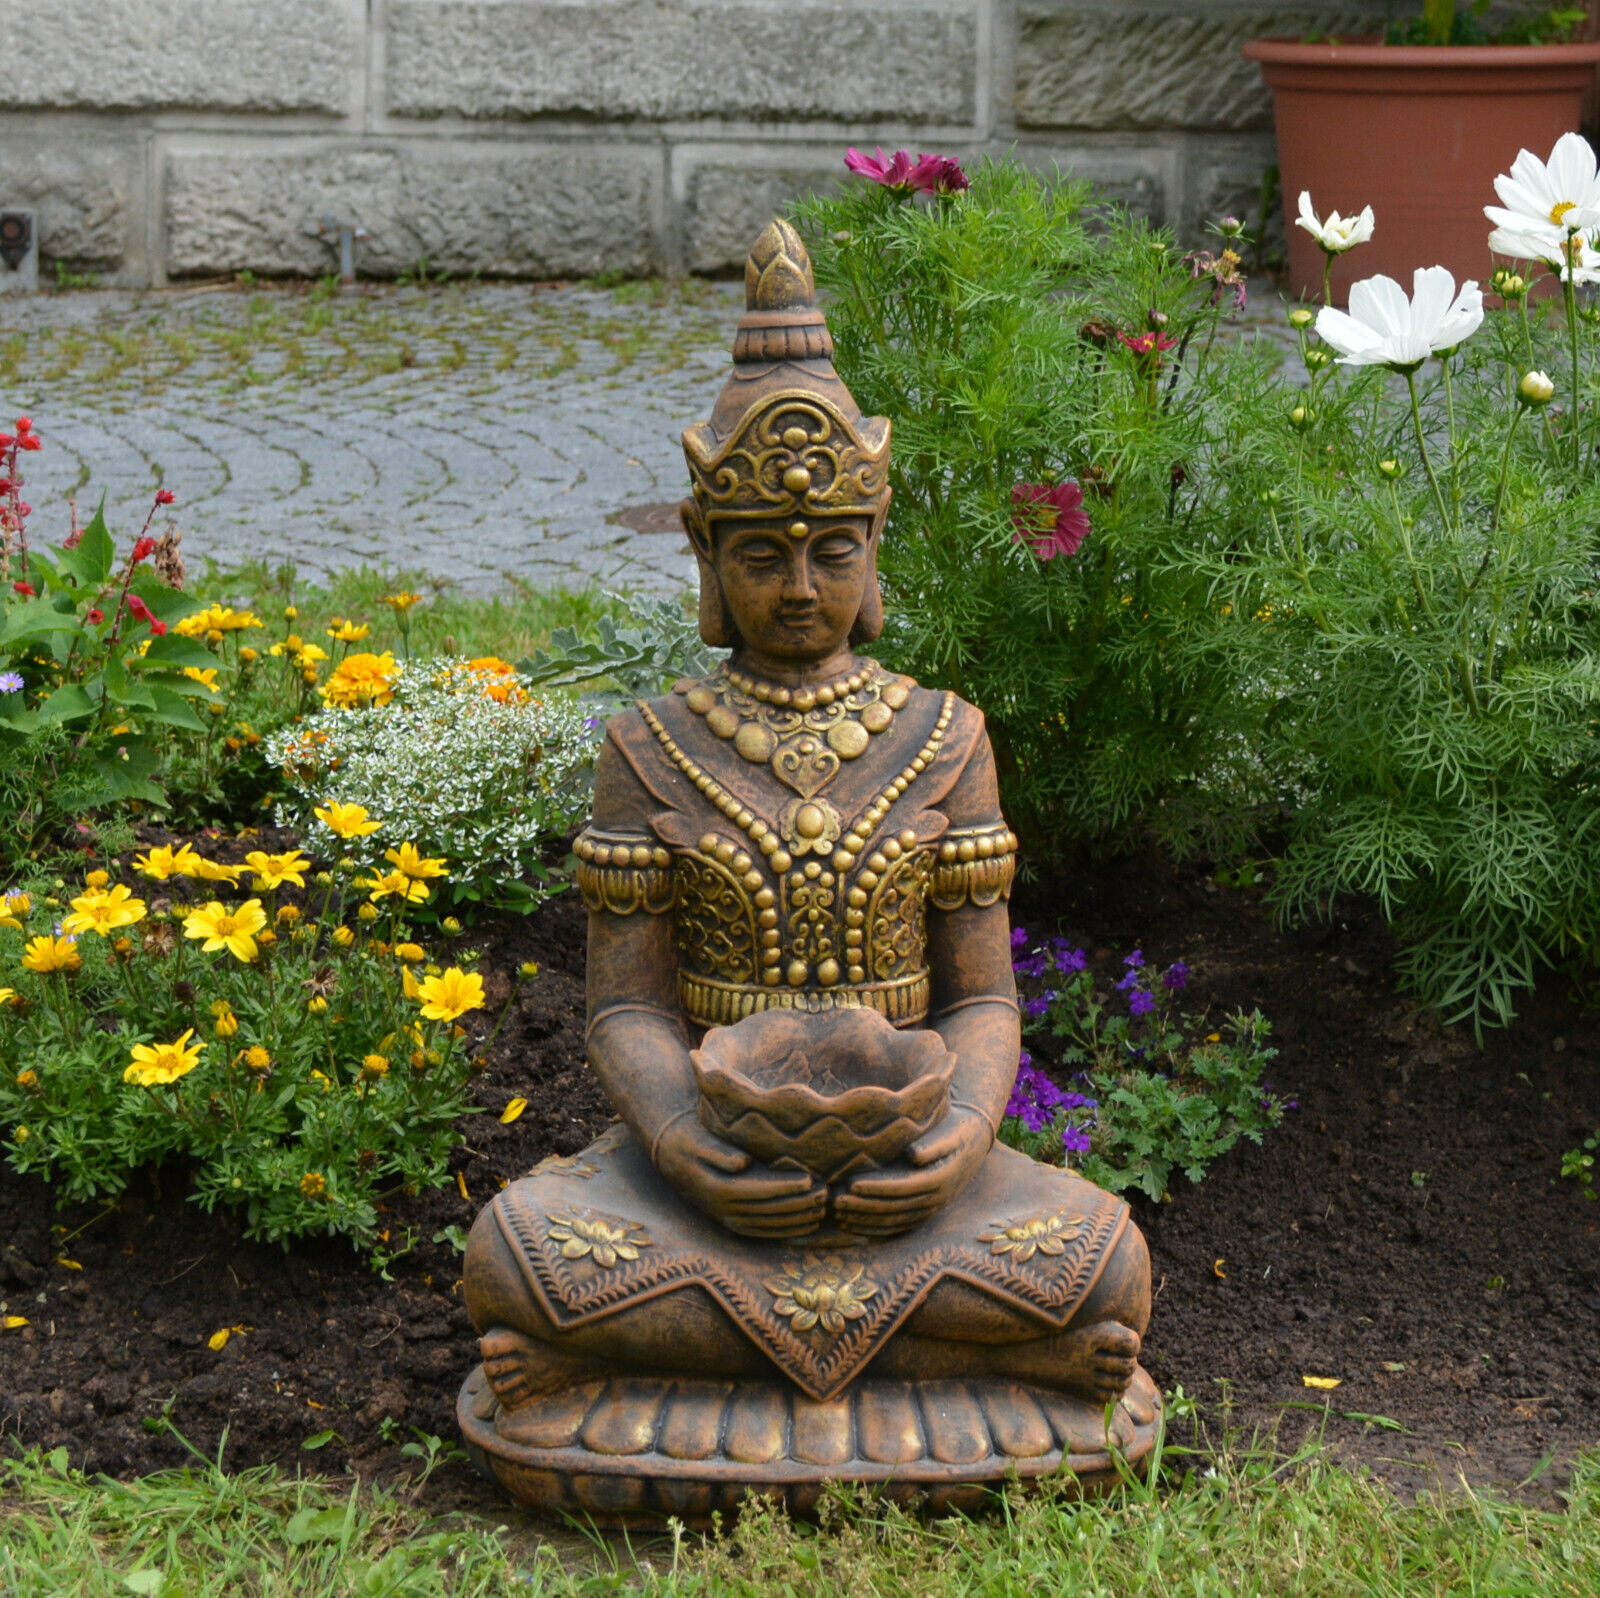 Macizo Figuras Piedra Grande Buda Guarda Del Templo Exclusivo de Moldeada